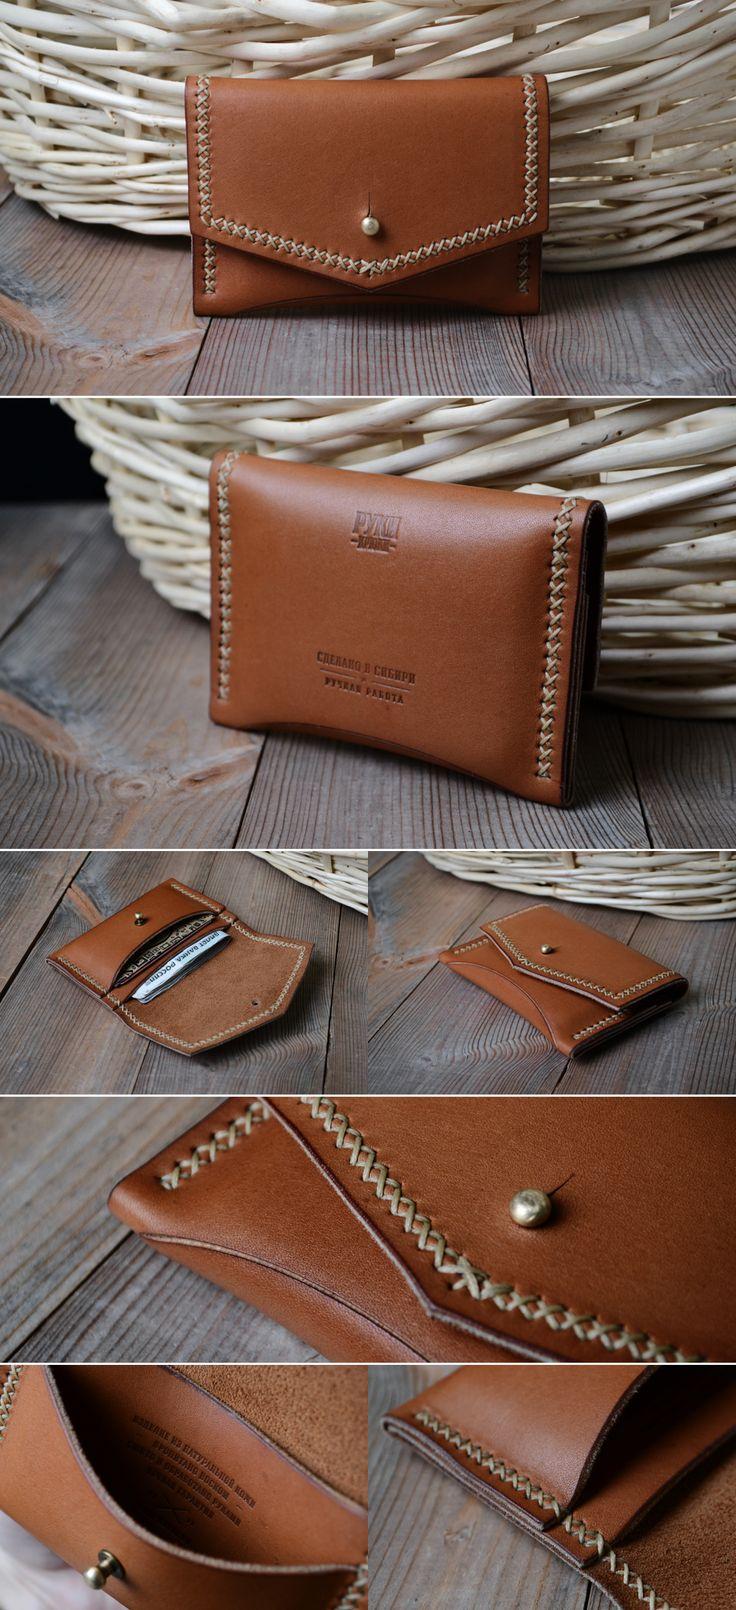 Little update for Card-holder RUKI-KRYKI / Made in Siberia                                                                                                                                                      More